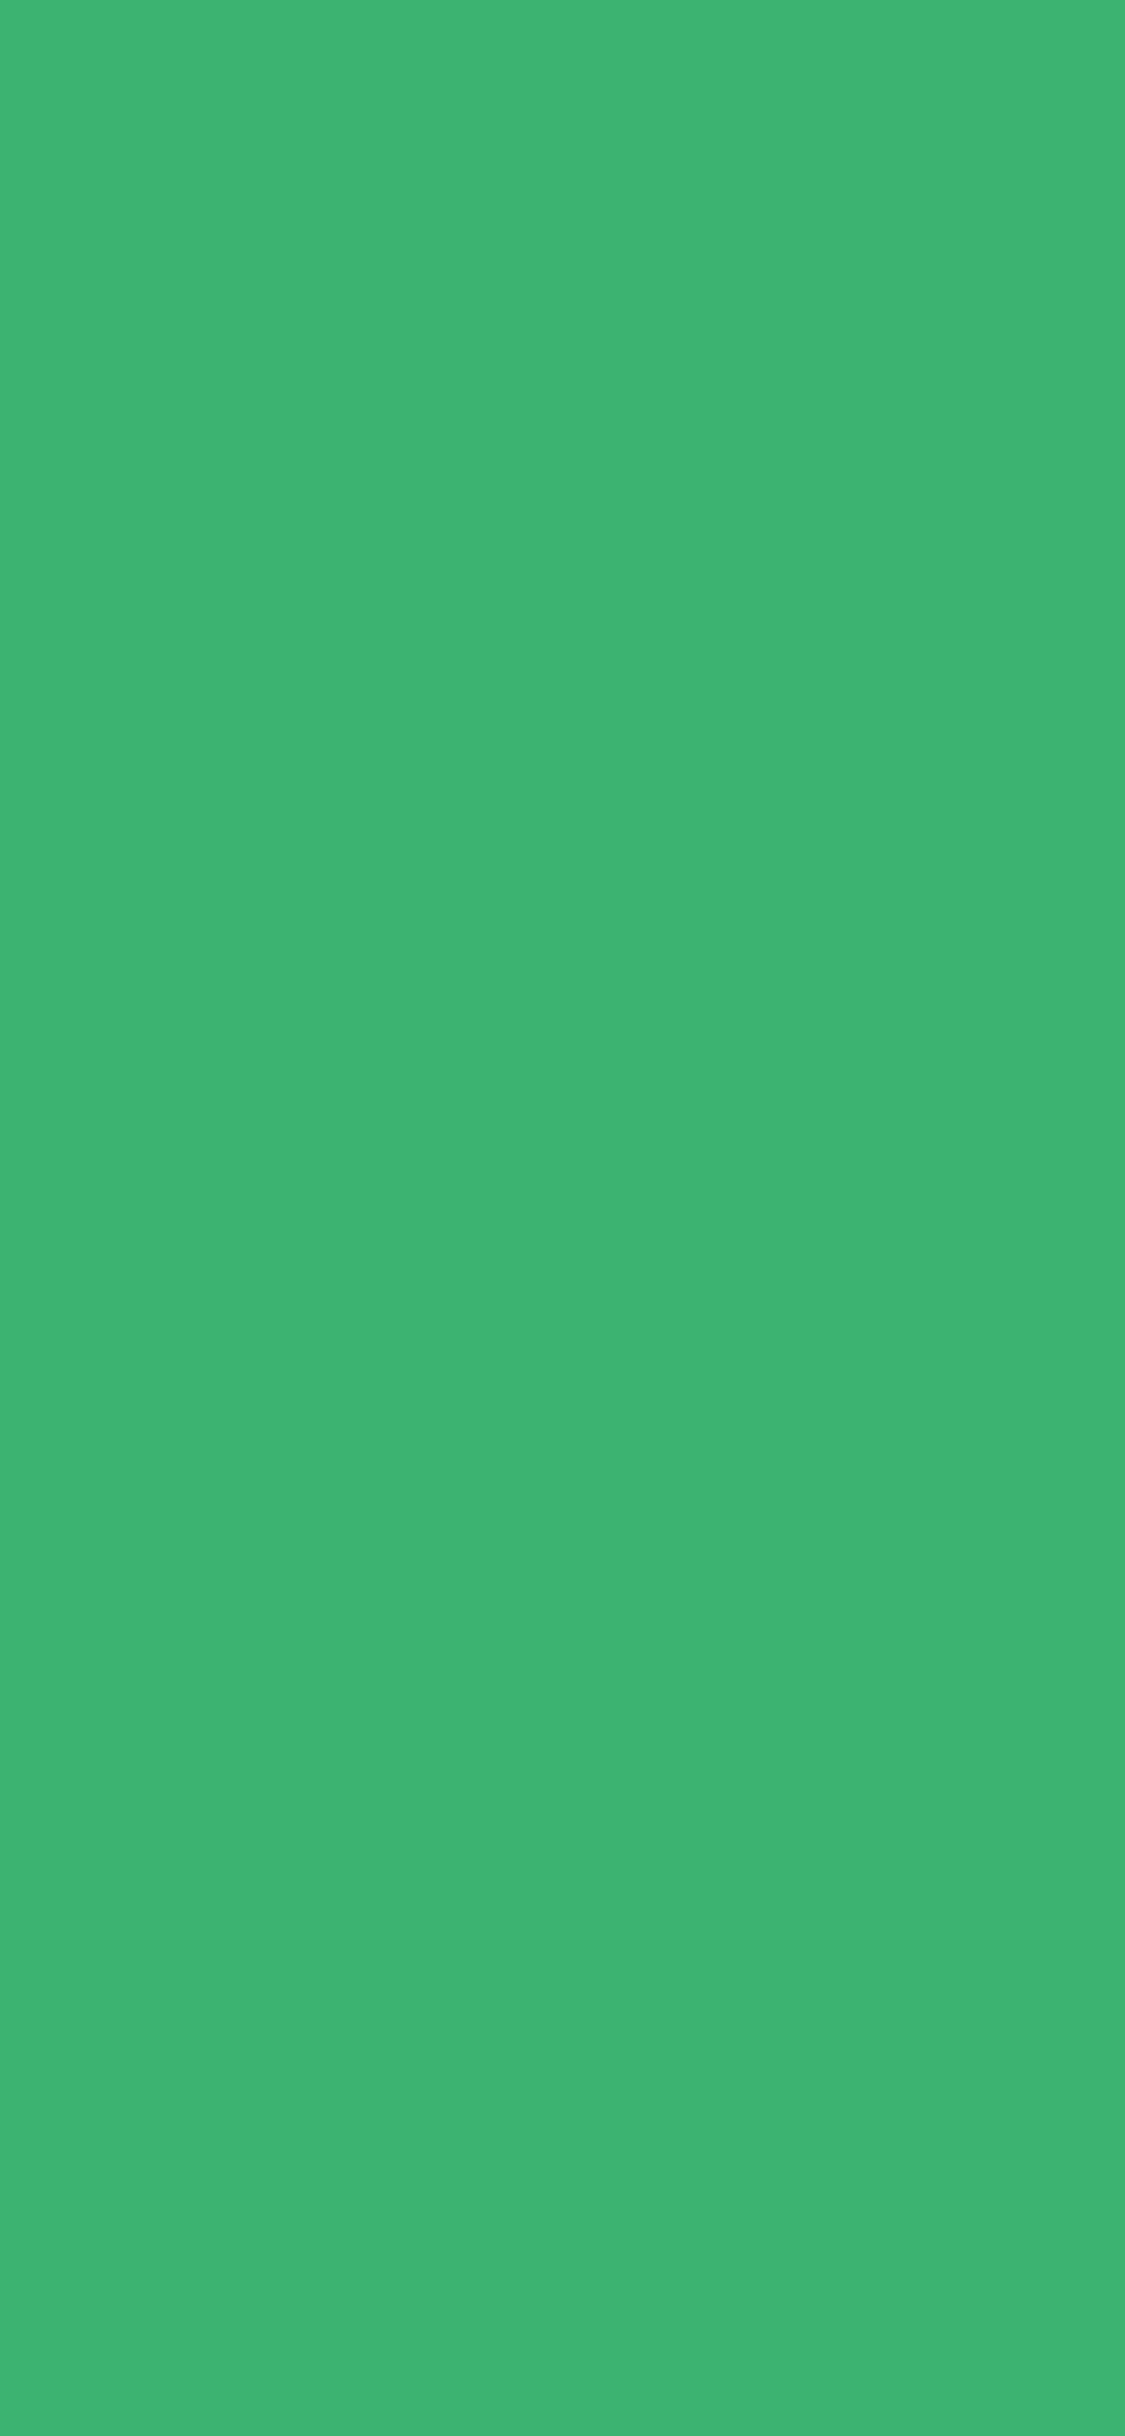 1125x2436 Medium Sea Green Solid Color Background